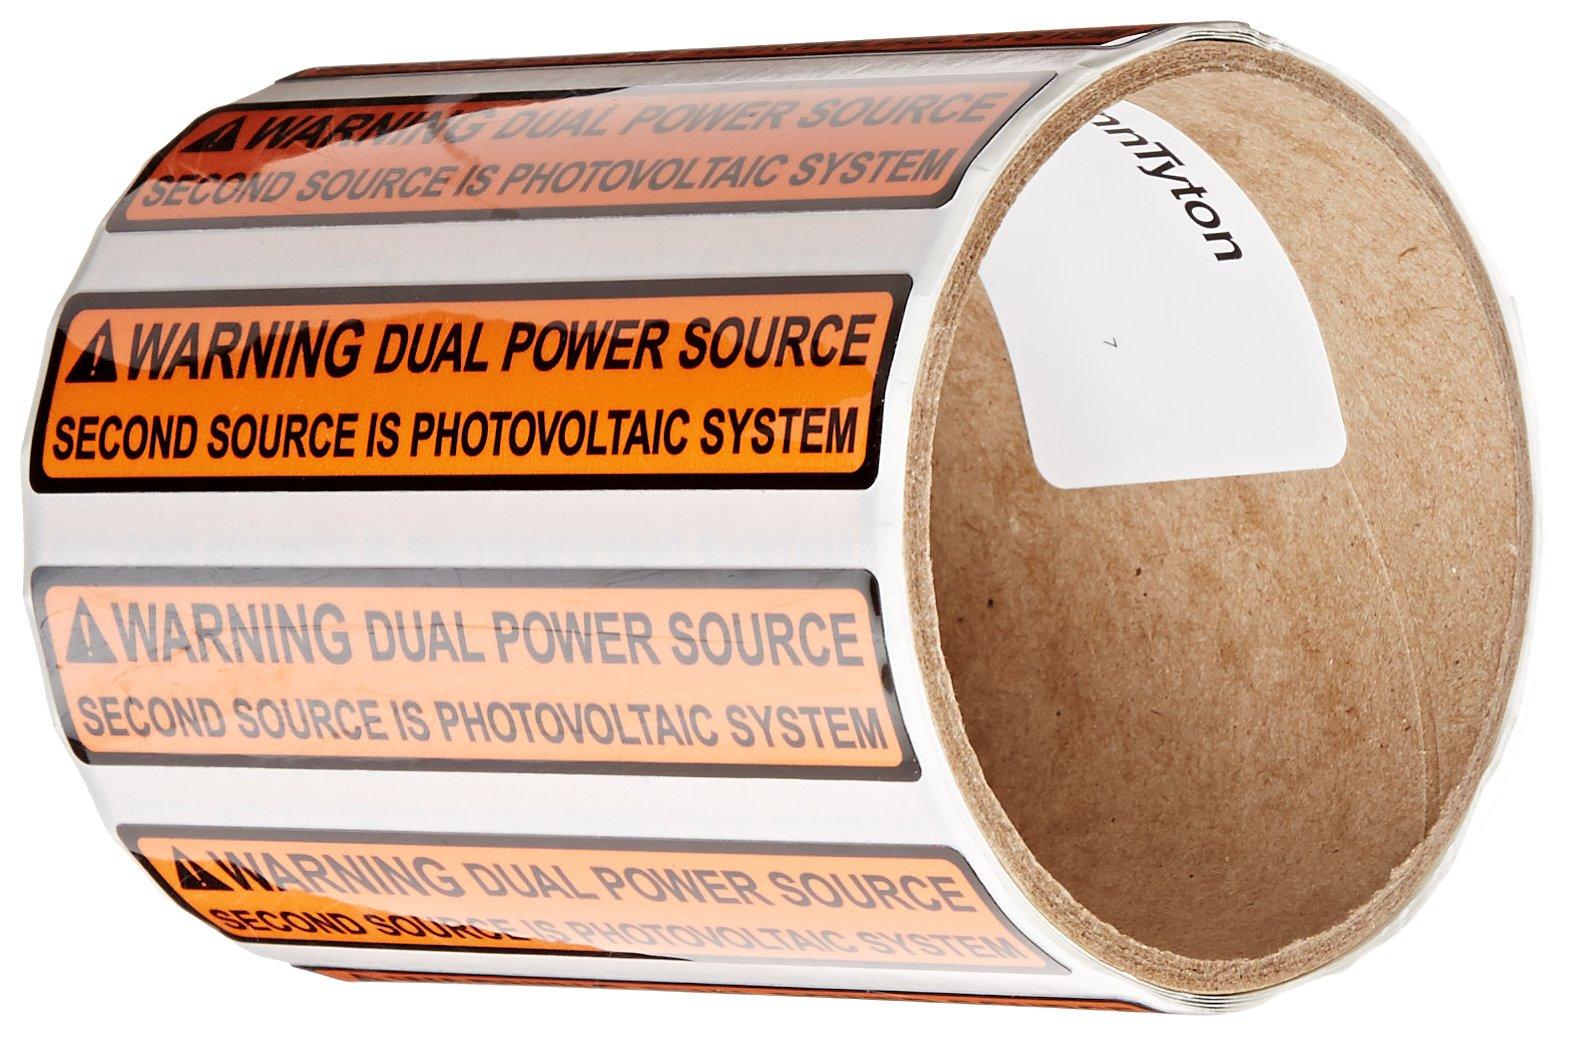 HellermannTyton 596-00495 Pre-Printed Solar Label, 4.12'' X 0.75'', WARNING - DUAL POWER SOURCE…, Orange (Pack of 50)